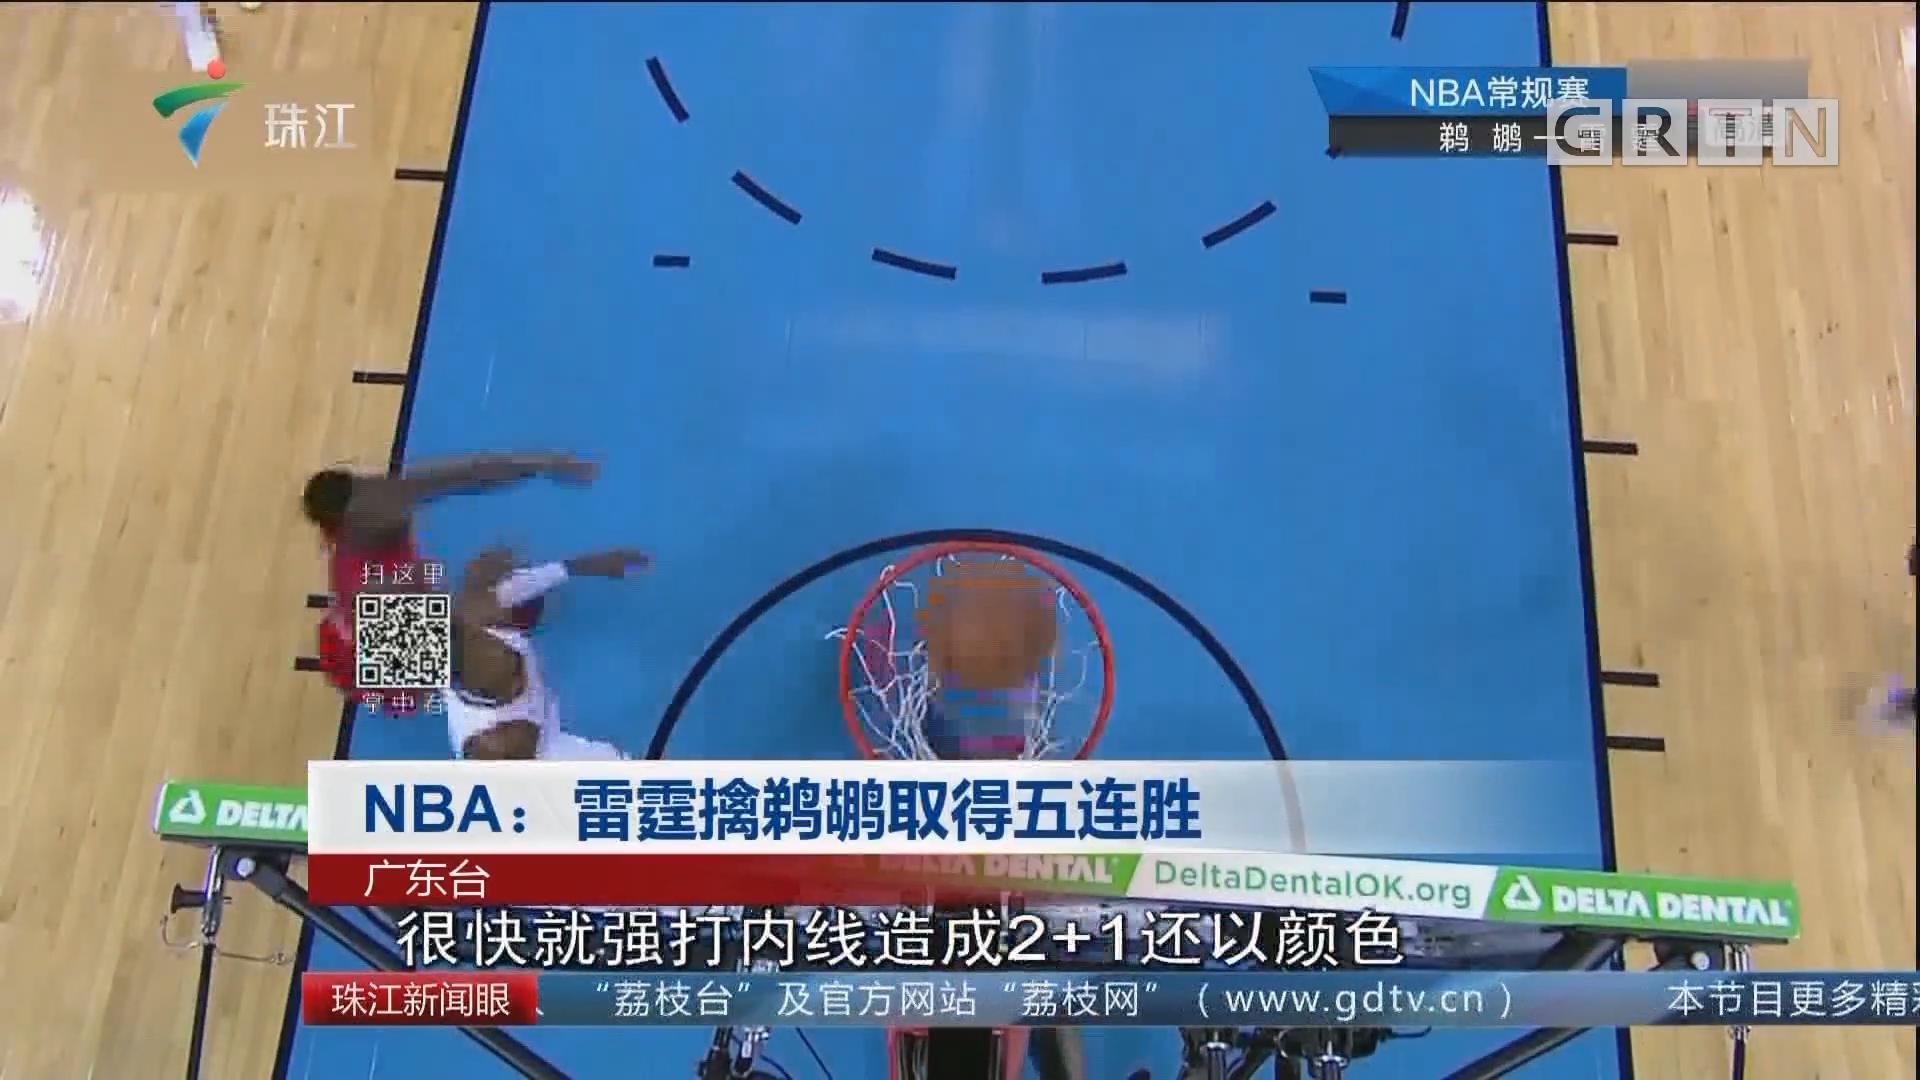 NBA:雷霆擒鹈鹕取得五连胜